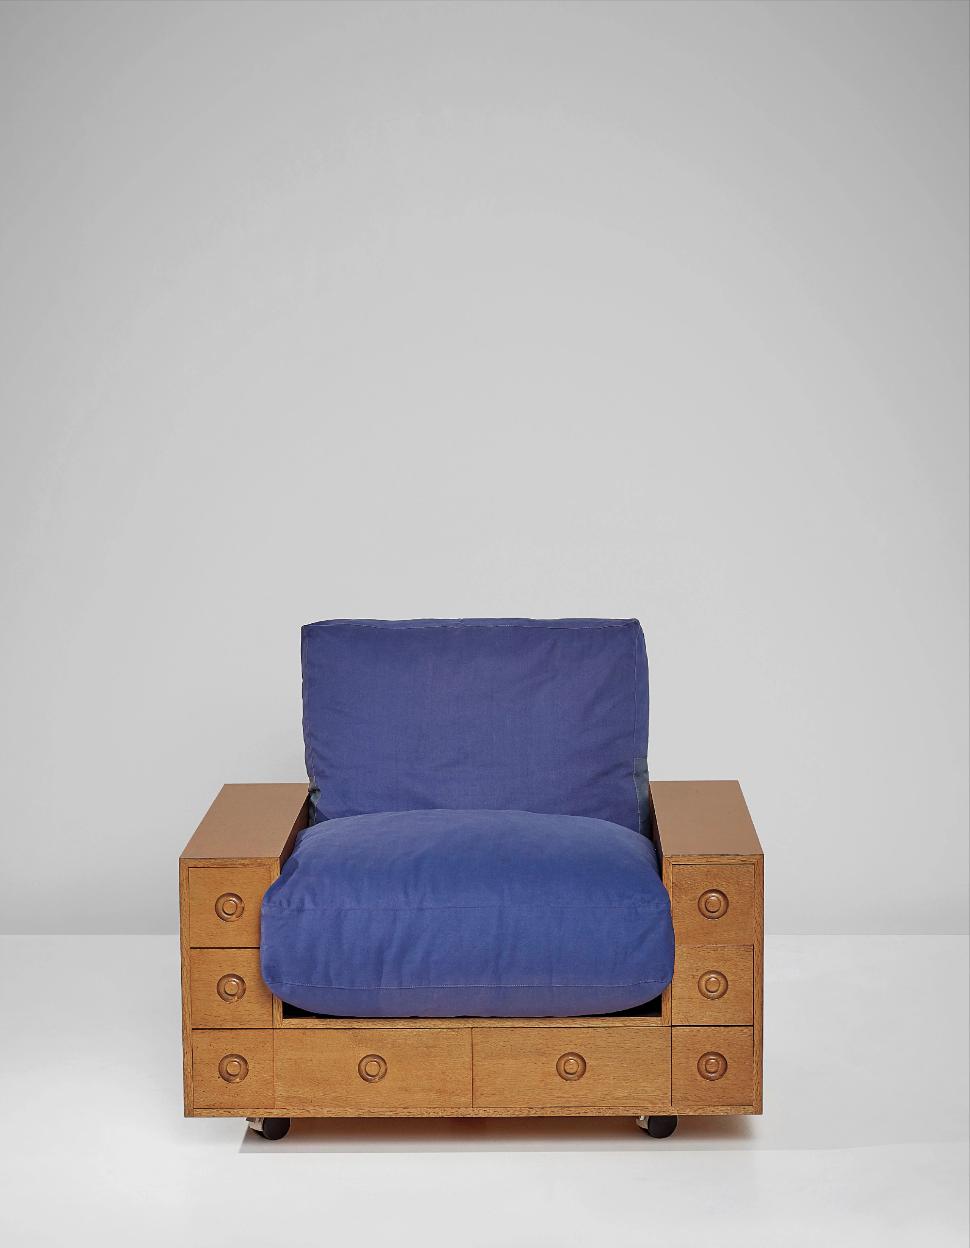 SHIRO KURAMATA Armchair, from the 'Furniture with Drawers' series